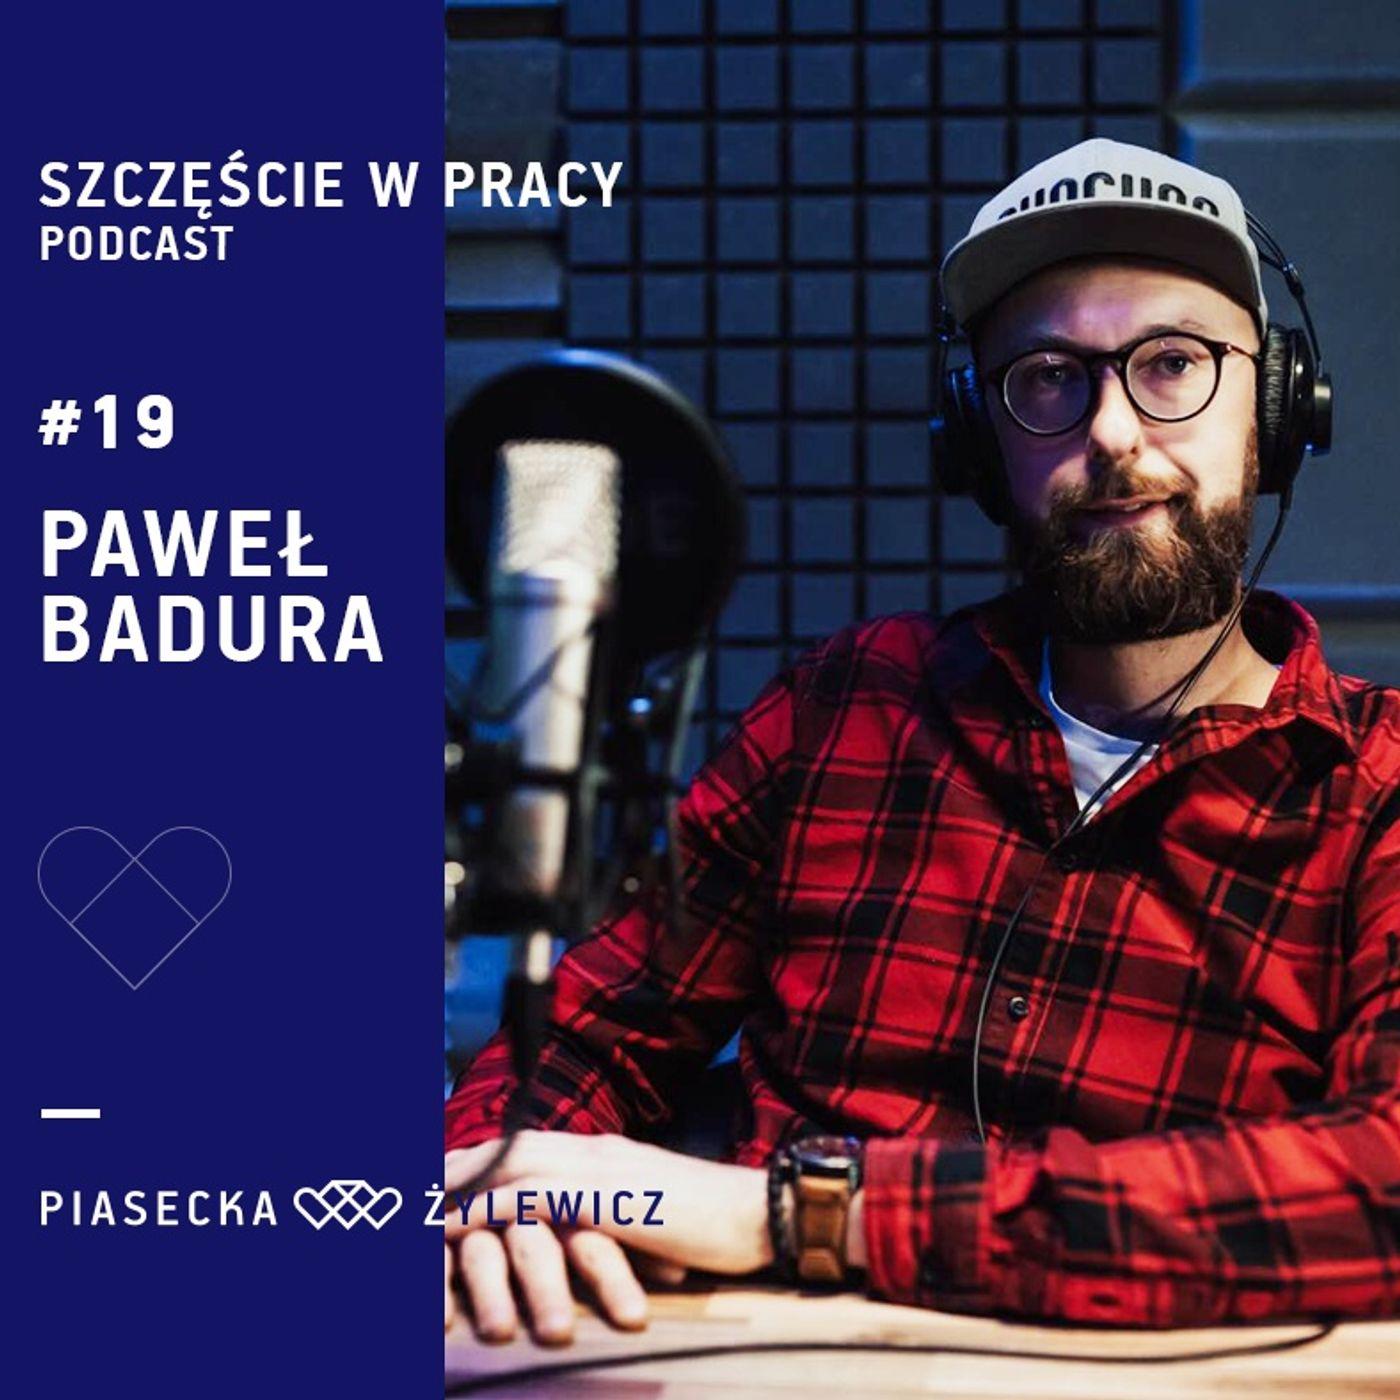 #19 Paweł Badura